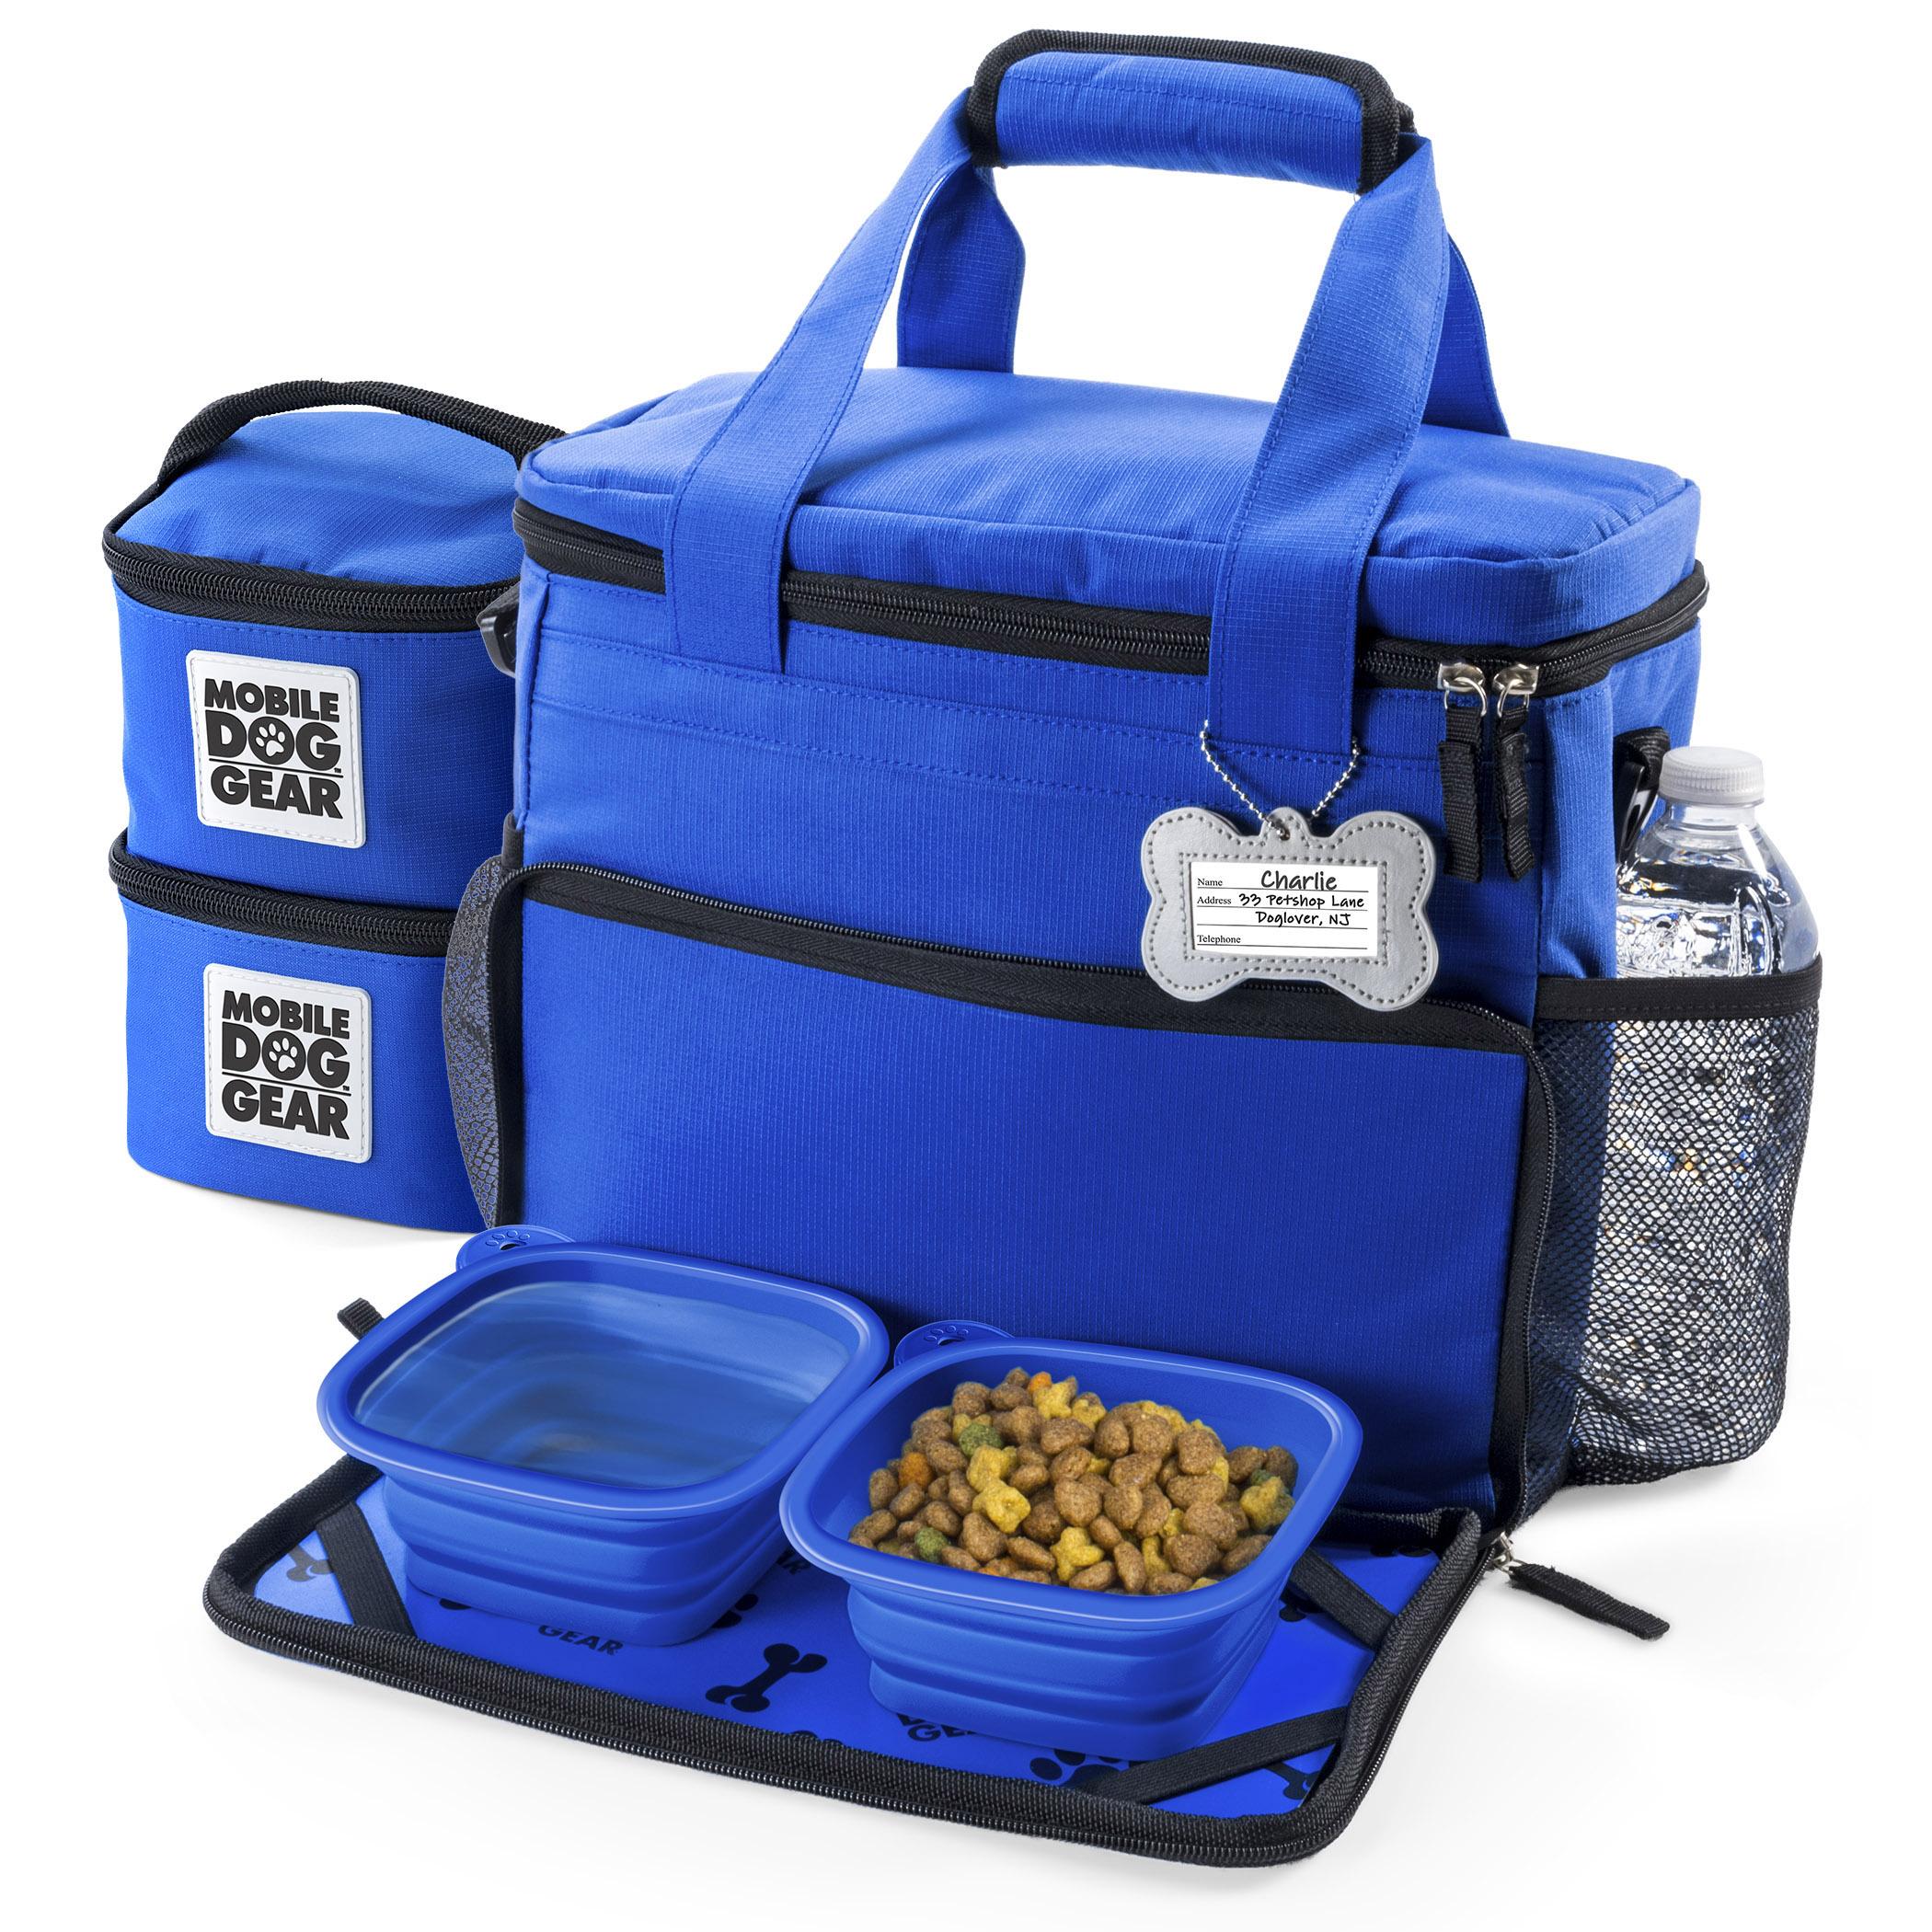 MDG SM Week Away-Blue Bag Shot and food carriers closedSquare.jpg